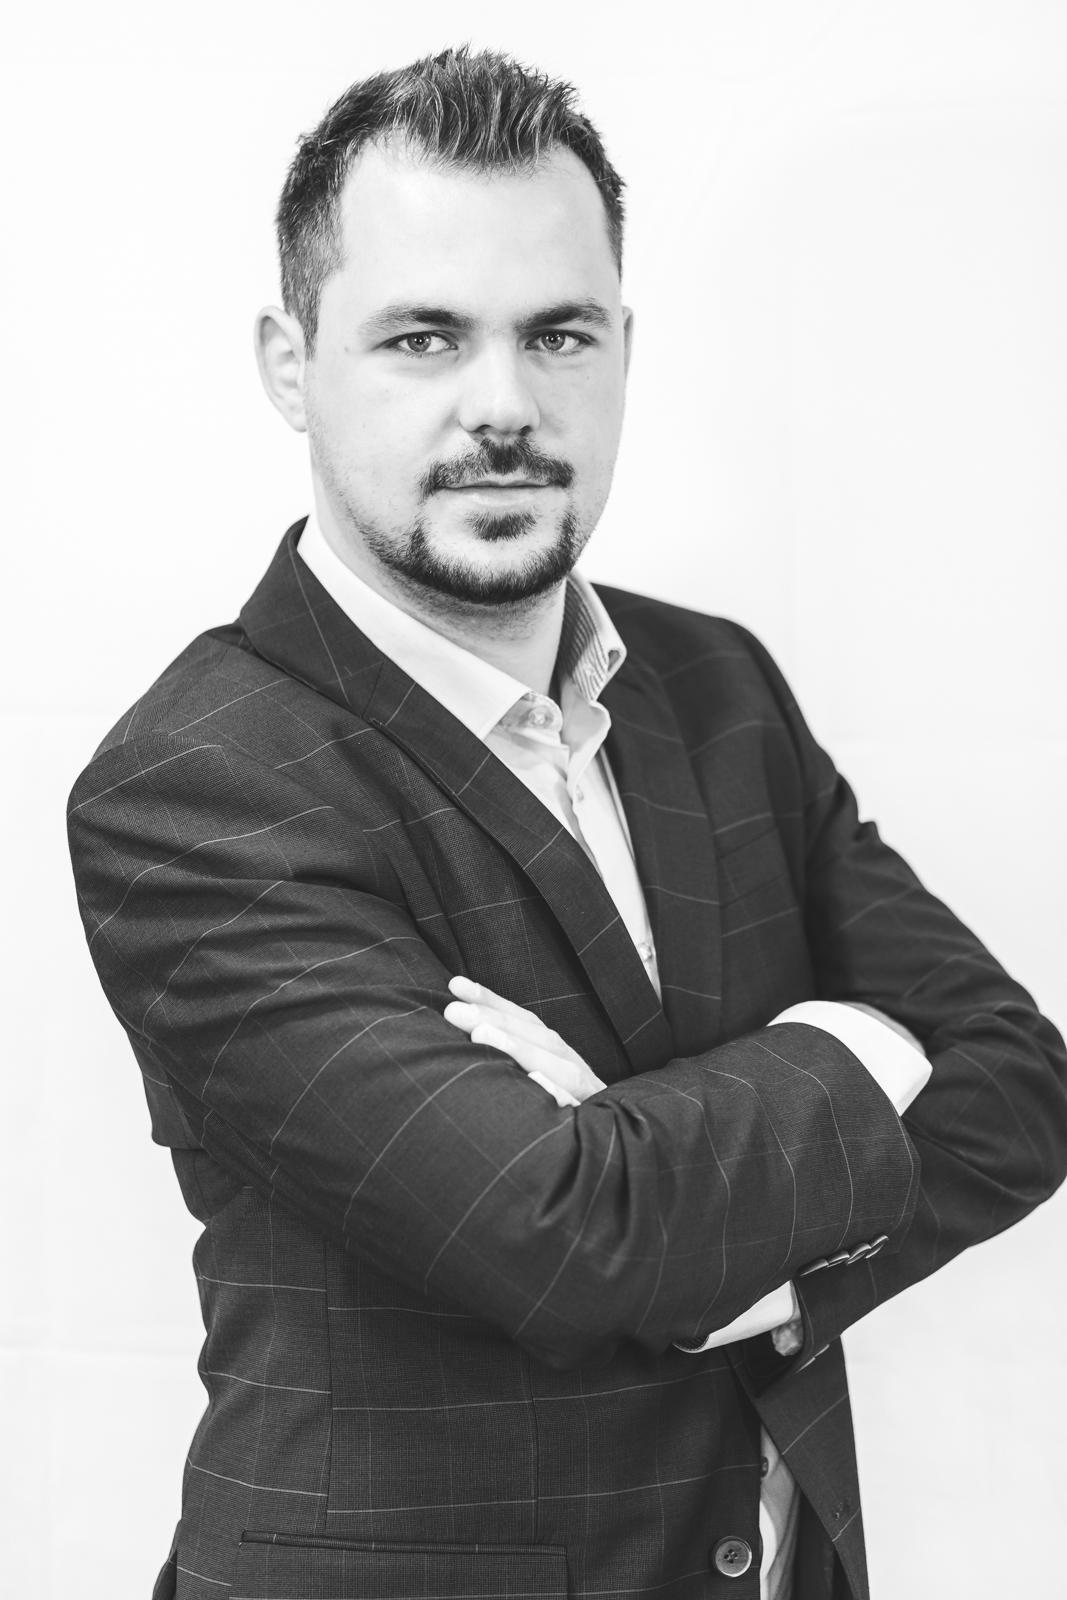 Harris Kouknakos - Content Writer